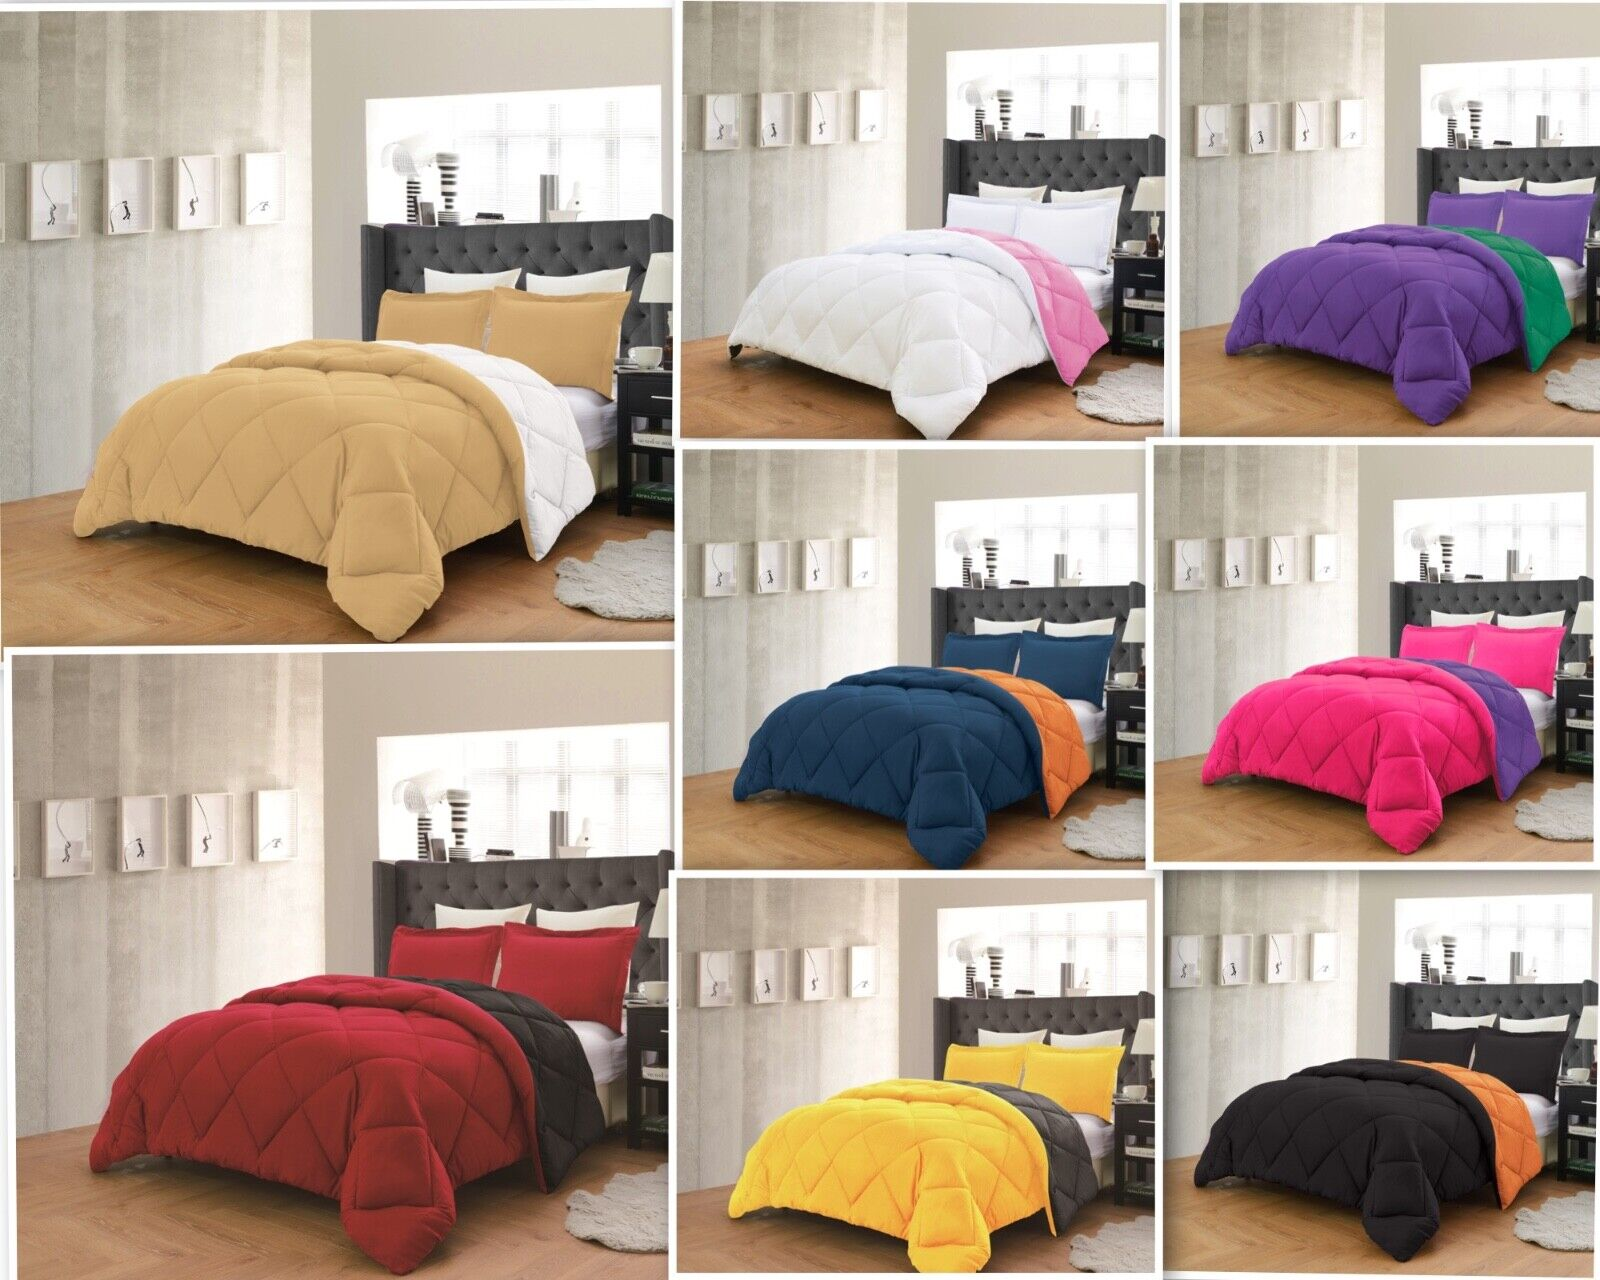 Ugg Avery 3 Piece Reversible King Comforter Set In Ocean For Sale Online Ebay